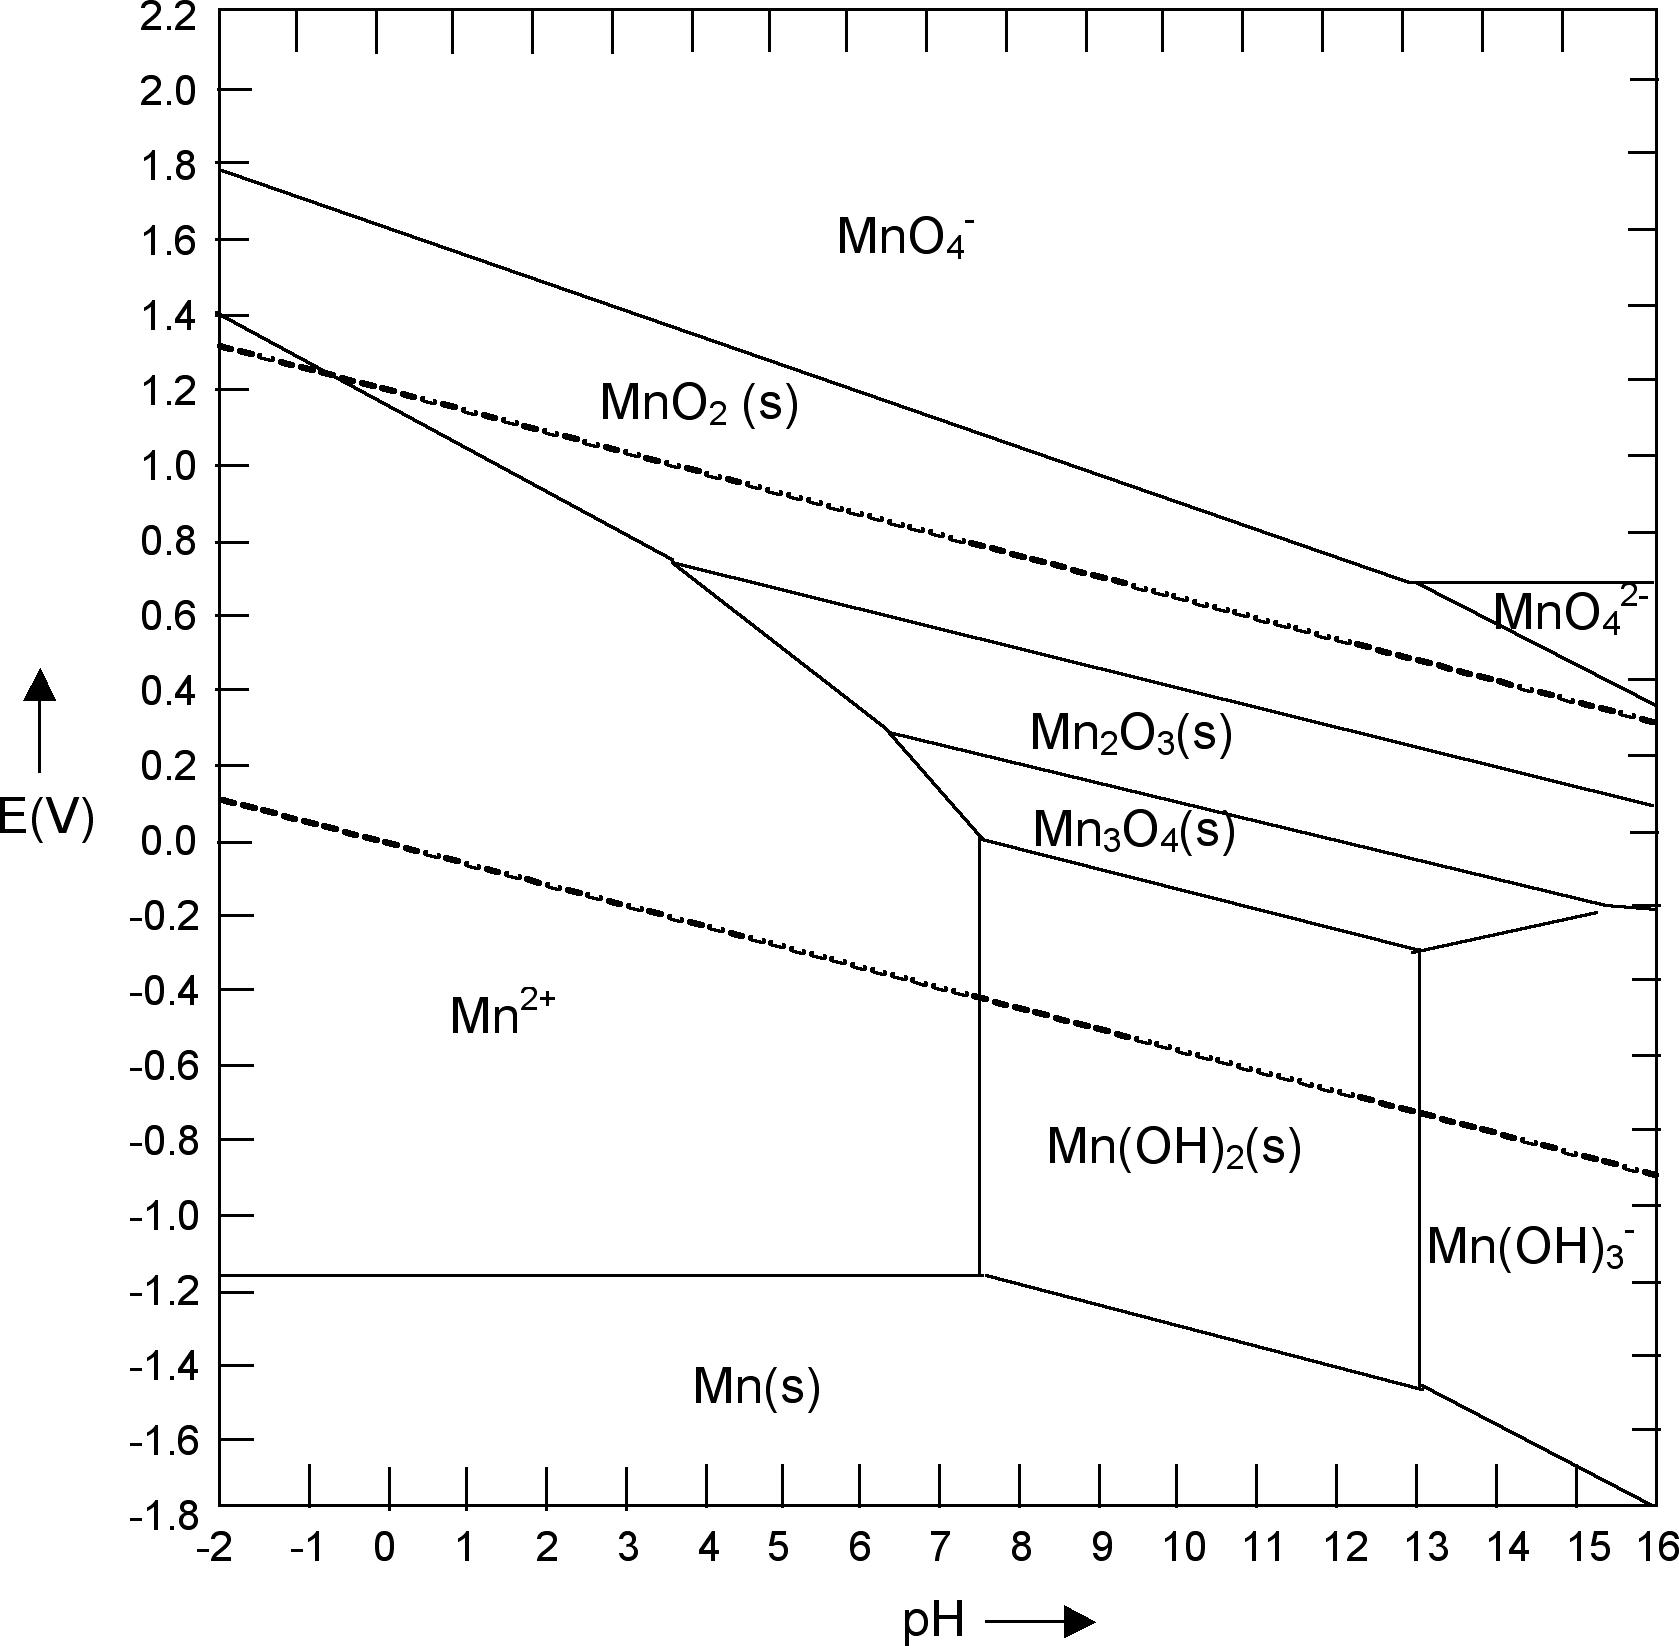 Filemn pourbaix diagramg wikimedia commons filemn pourbaix diagramg ccuart Gallery